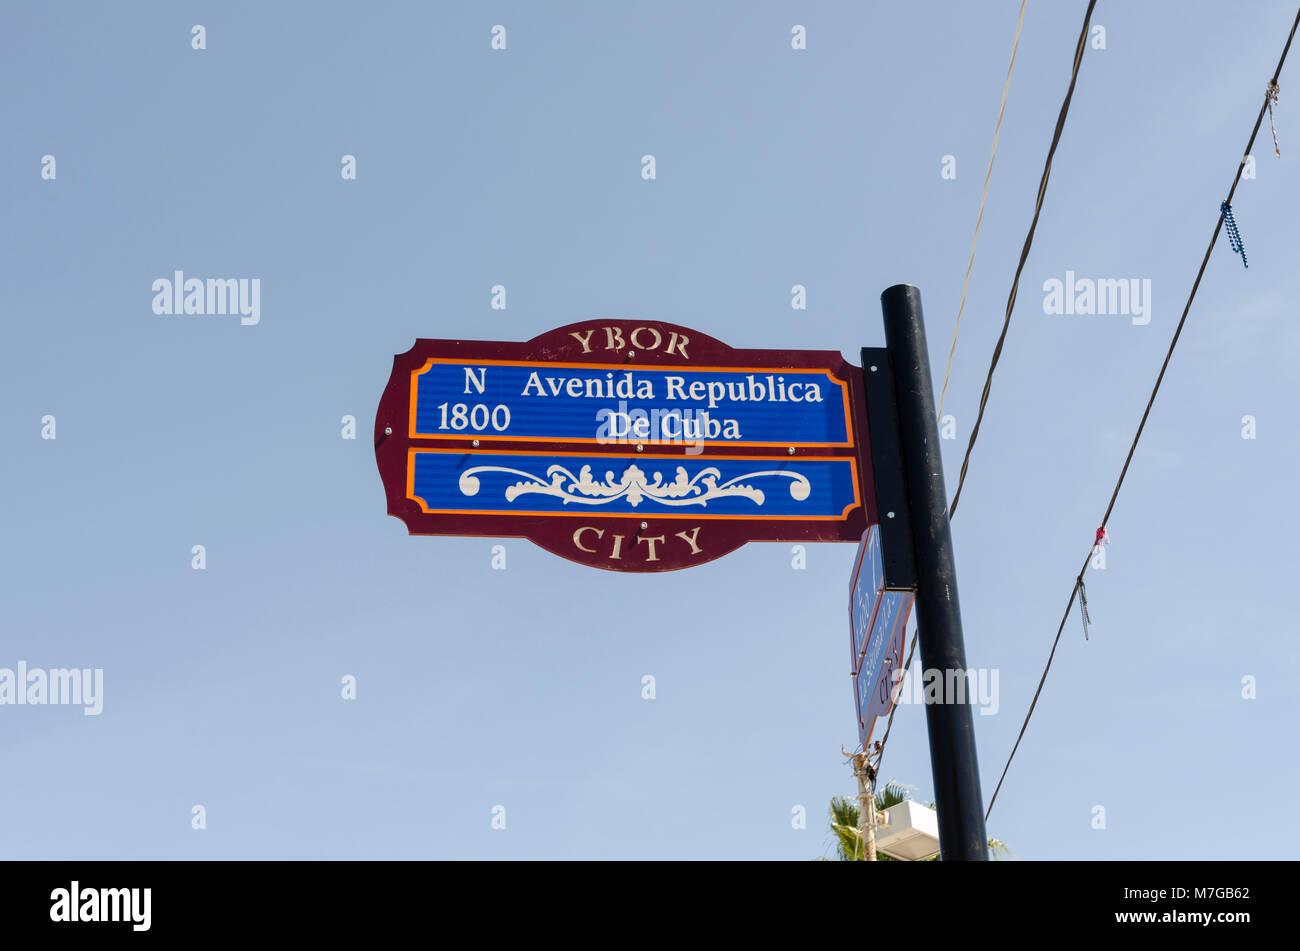 Avenida Repbulica De Cuba street sign, Ybor City, Florida - Stock Image